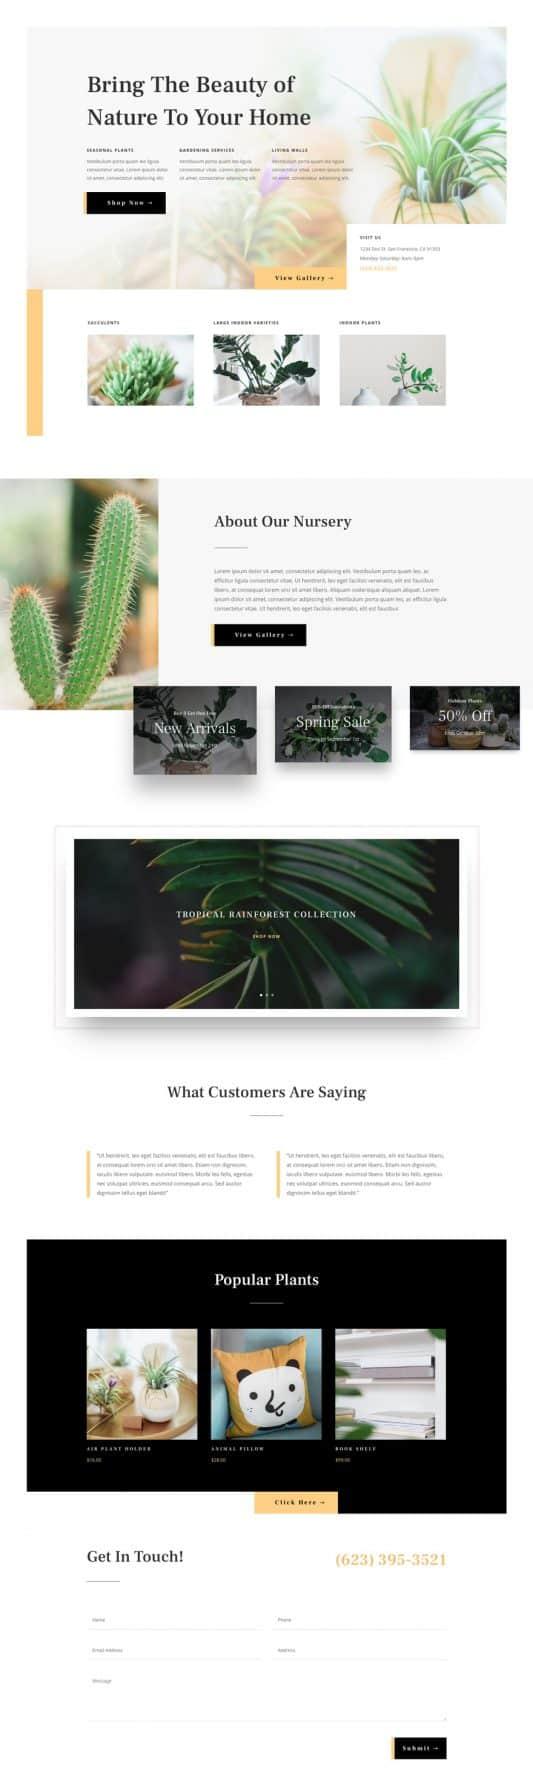 Plant Nursery Web Design 5